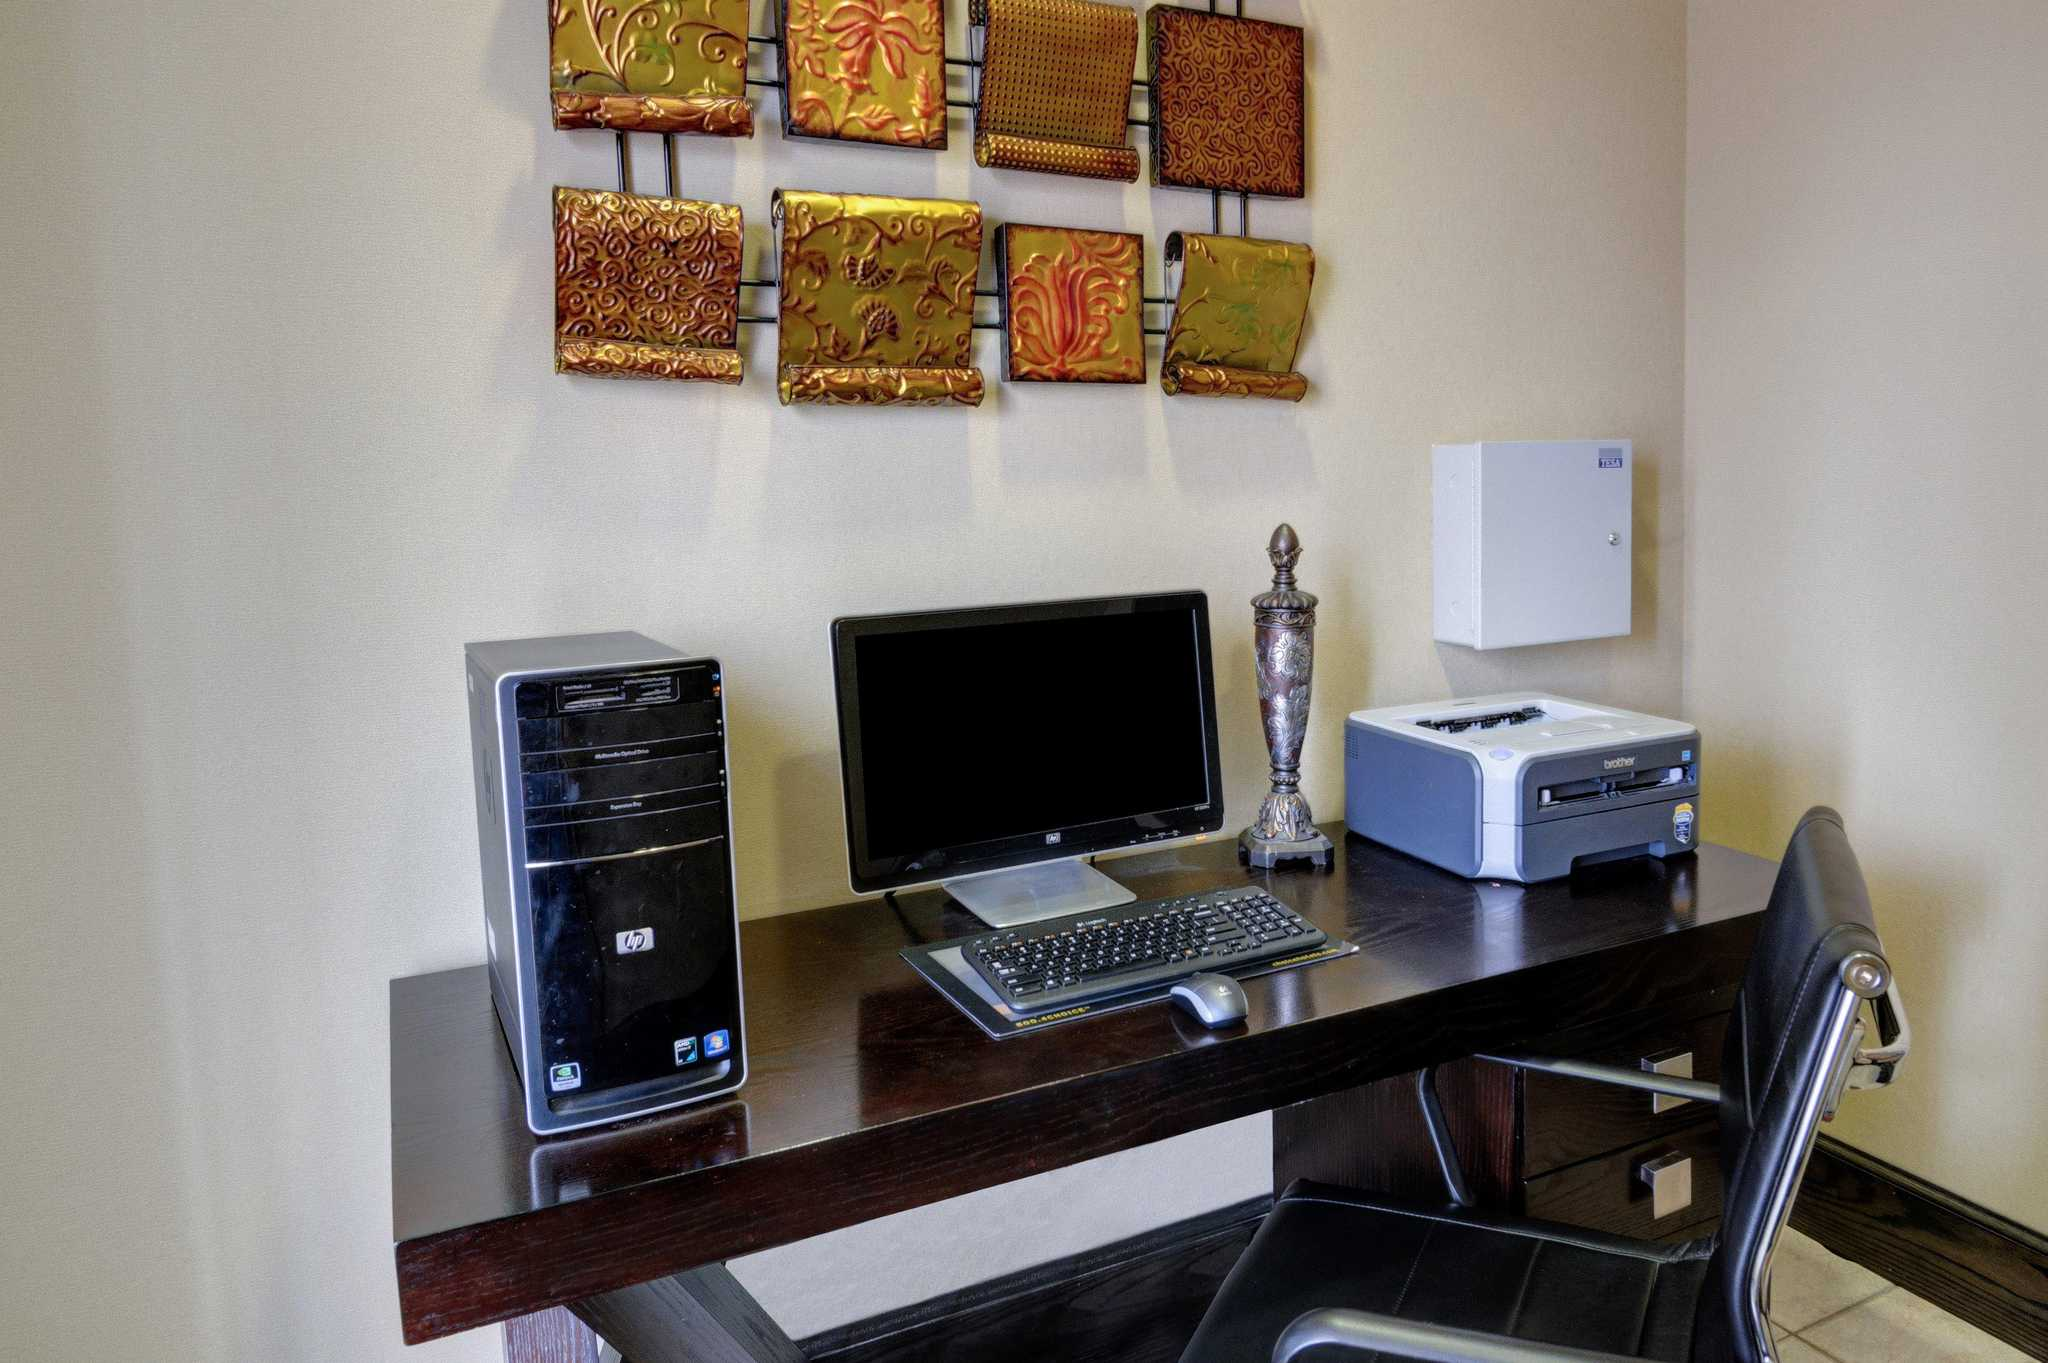 Comfort Inn & Suites image 37